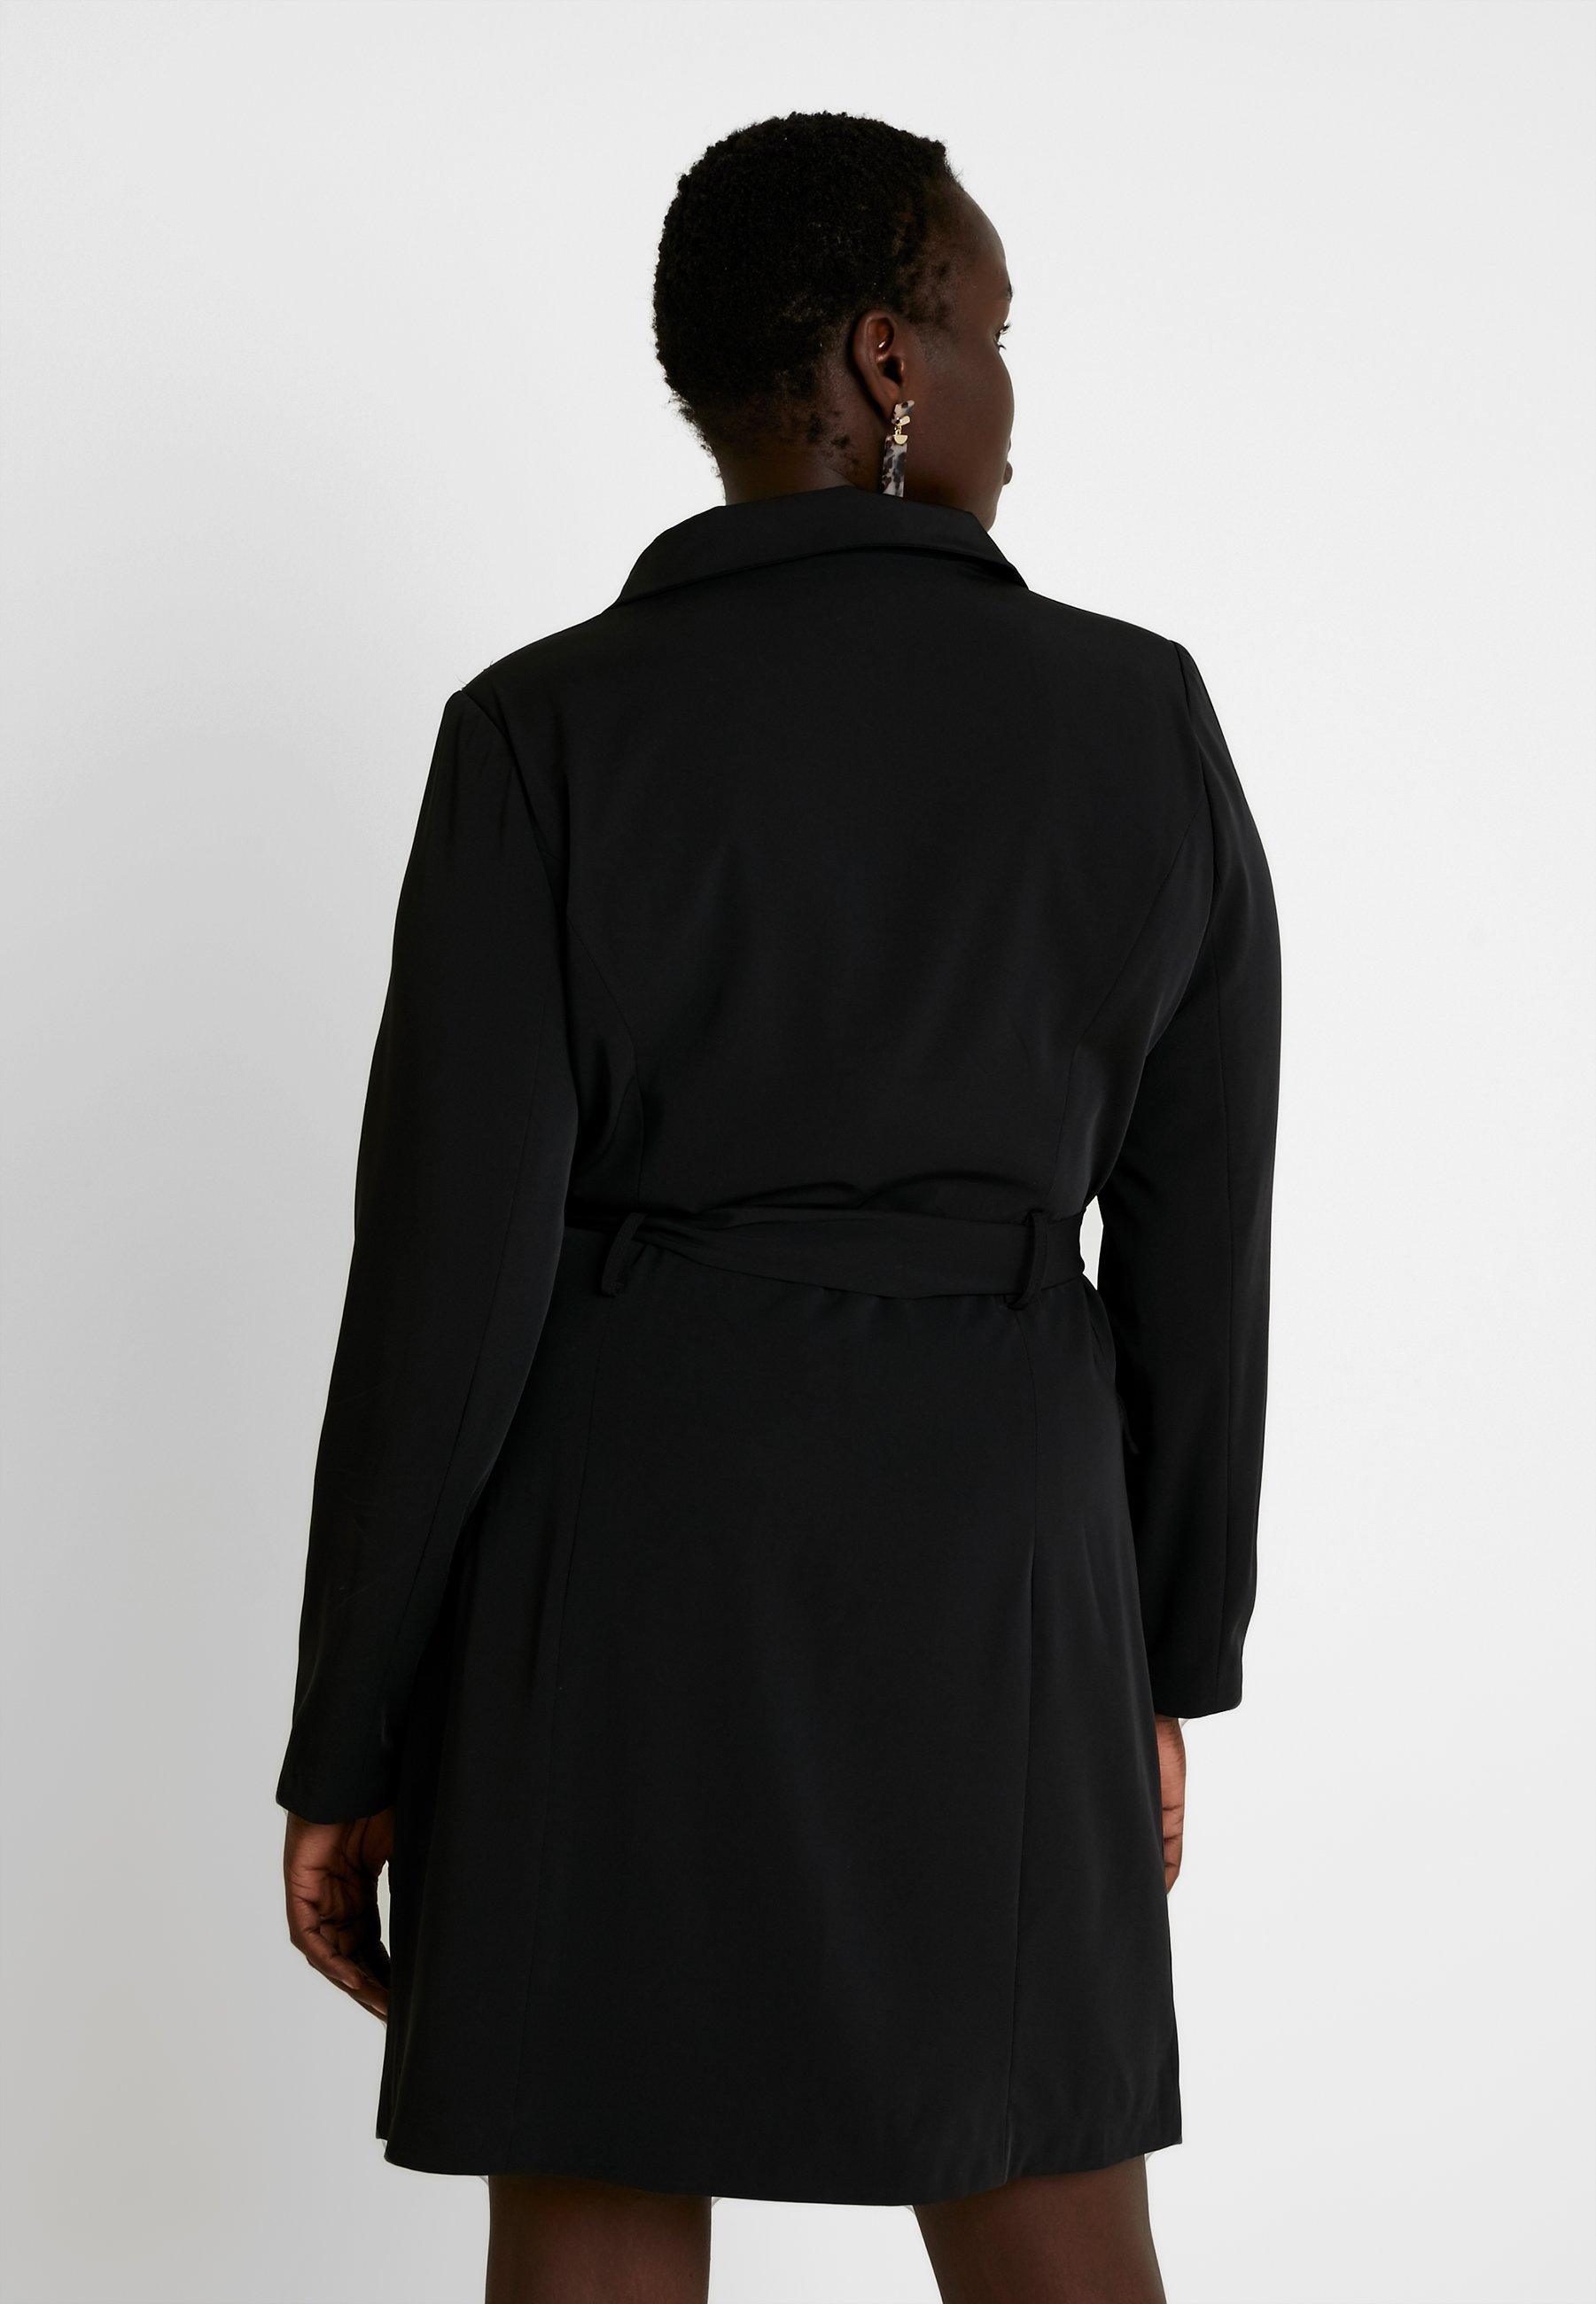 Belted Glamorous Blazer DressRobe Black Curve Soirée De Aj5RqL34